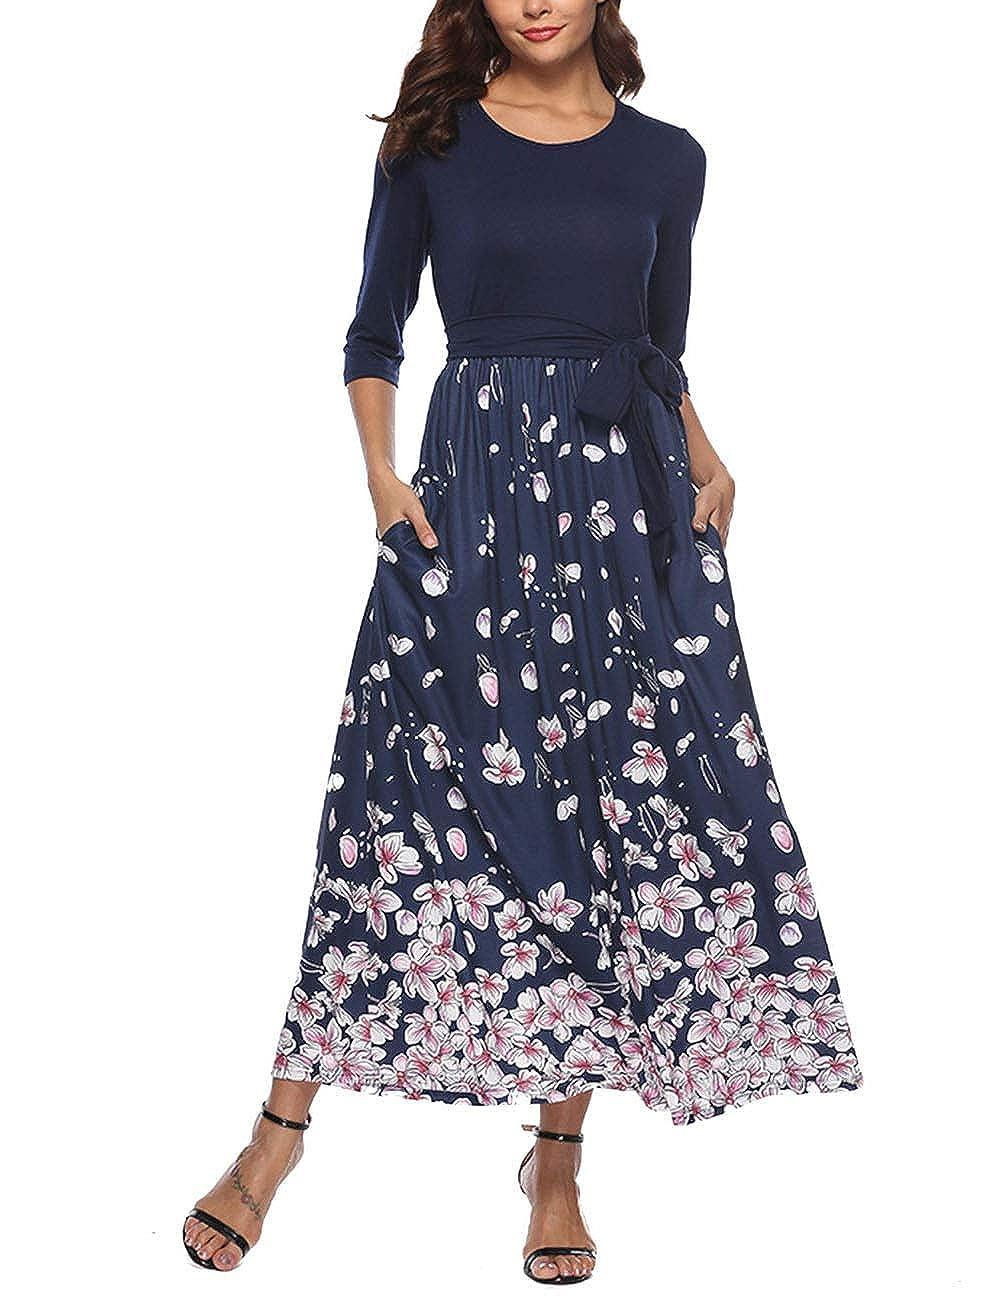 bluee Print YUMDO Women's Short Sleeve Floral Print T Shirt Vintage Blouse Top Asymmetric Hem